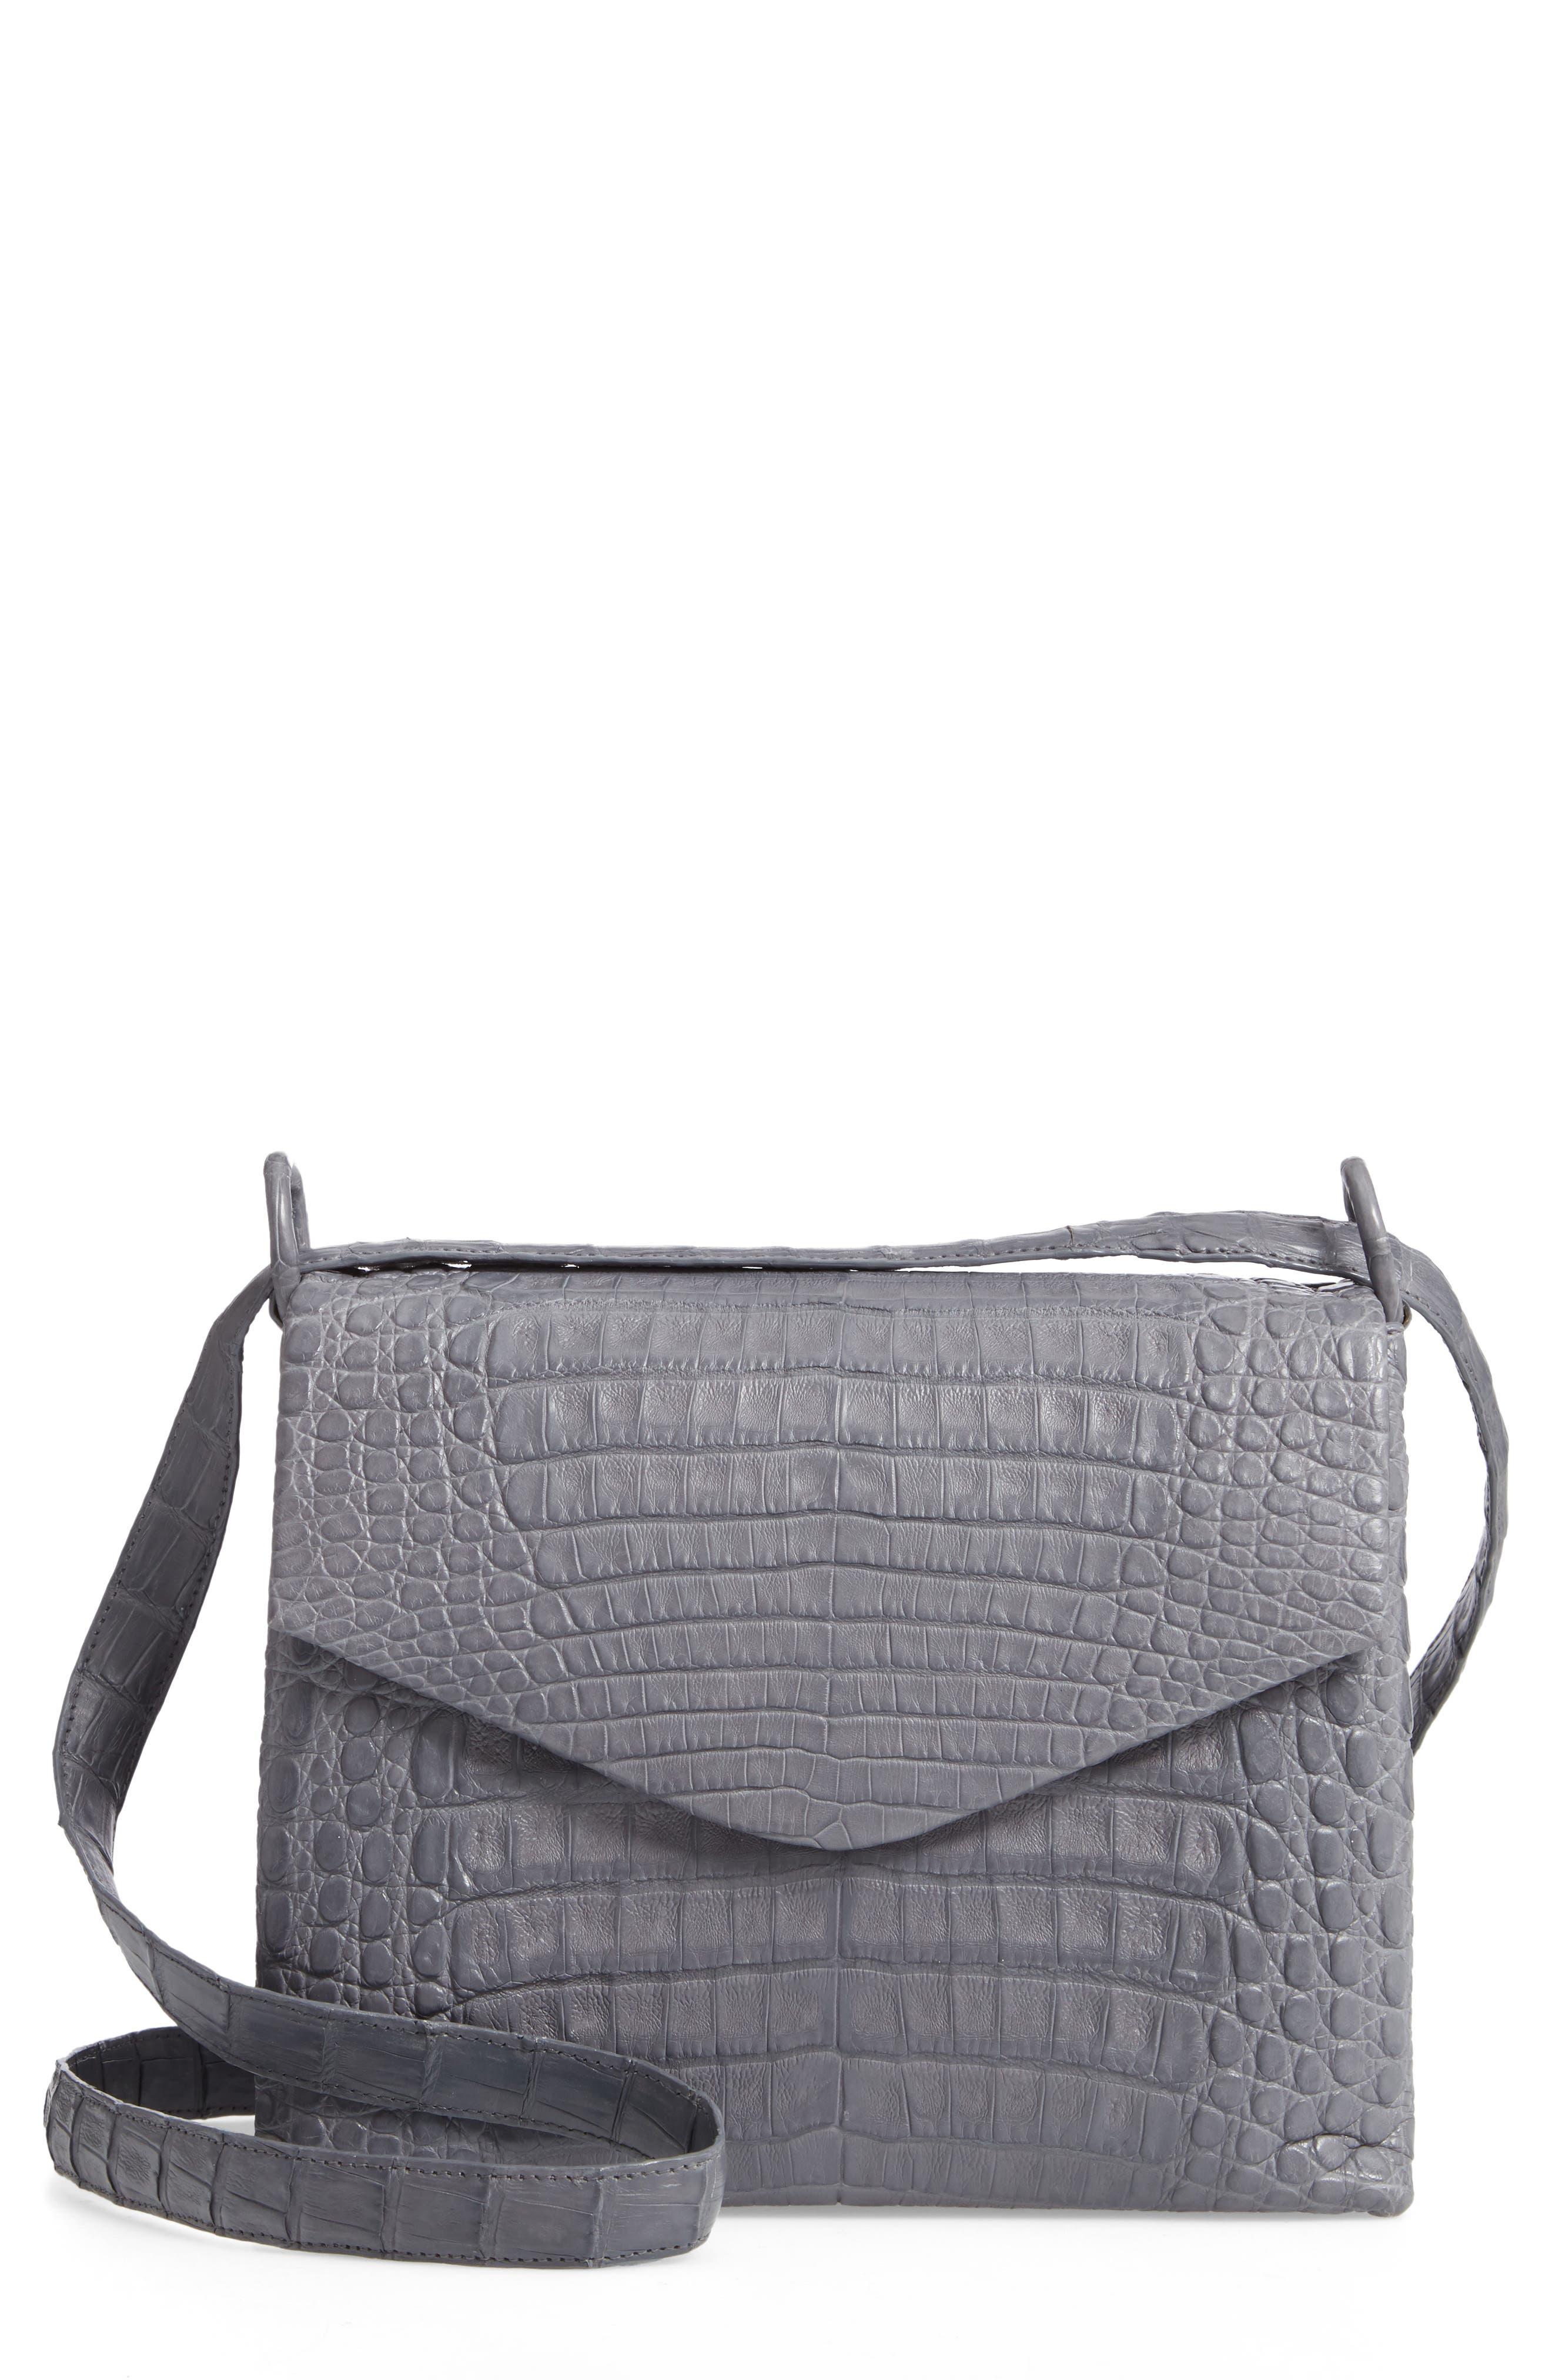 NANCY GONZALEZ Medium Astor Crossbody Genuine Crocodile Bag, Main, color, GREY MATTE